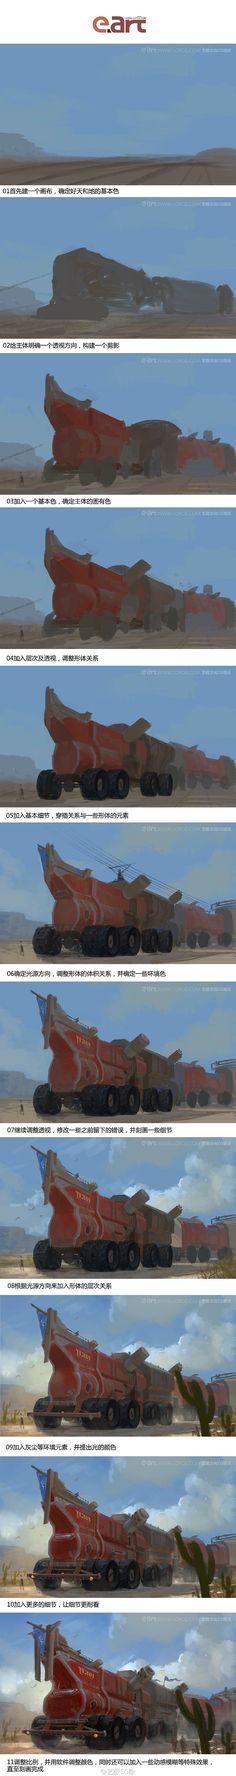 Tutorials CG scene scene scene of the original painting @ rolls collected jiao cheng (331 Figure) _ petal UI interaction design